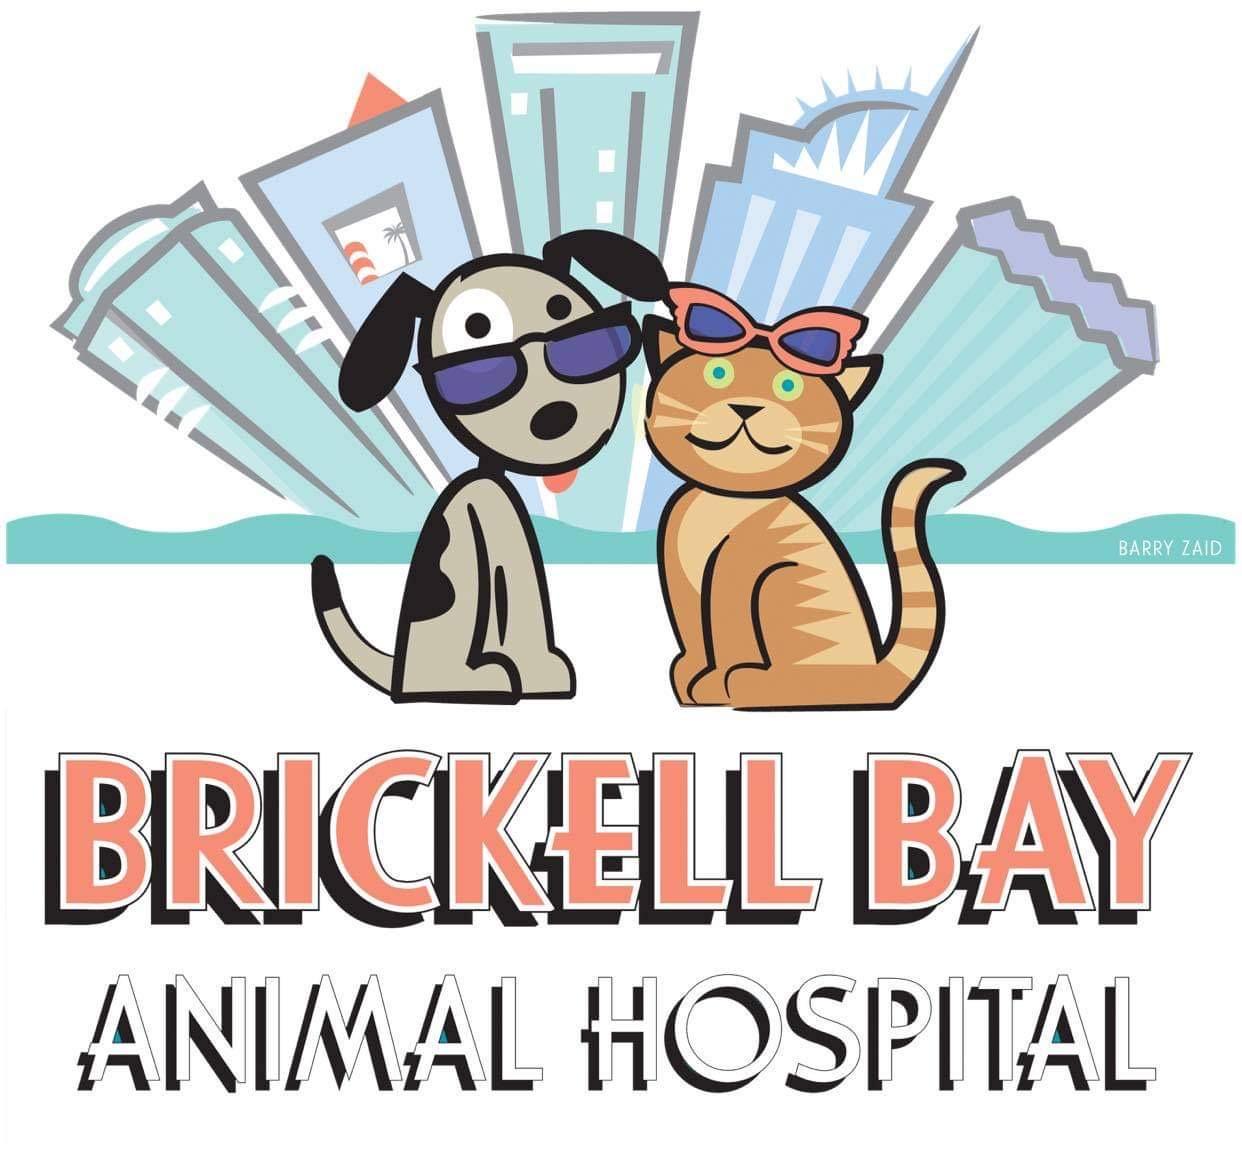 brickell bay animal hospital logo